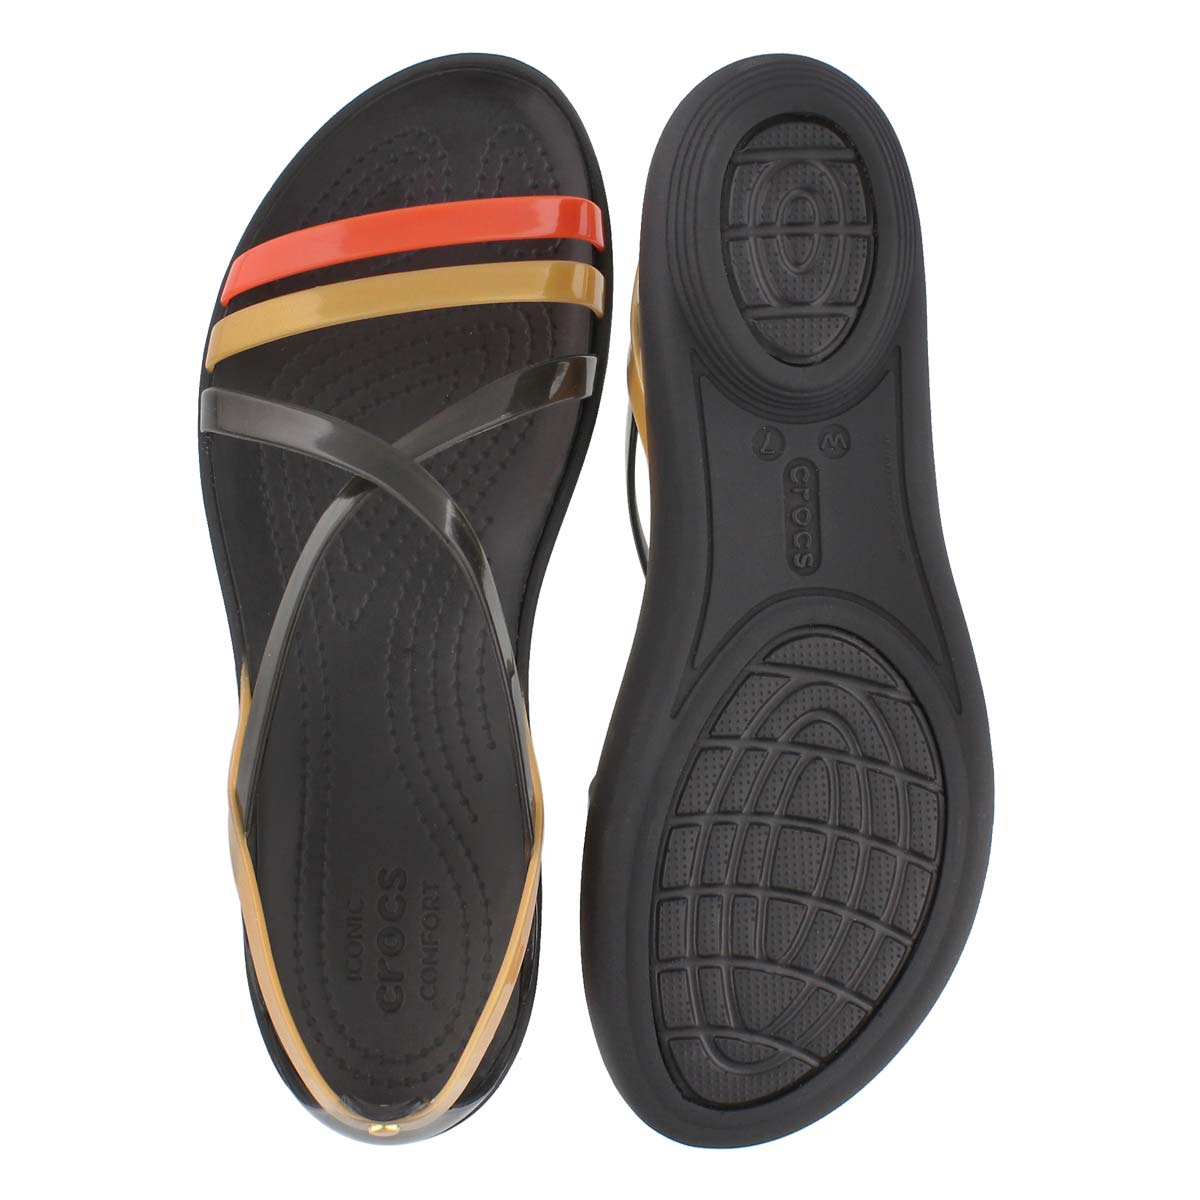 Lds Drew Isabella Strappy blk/gld sandal